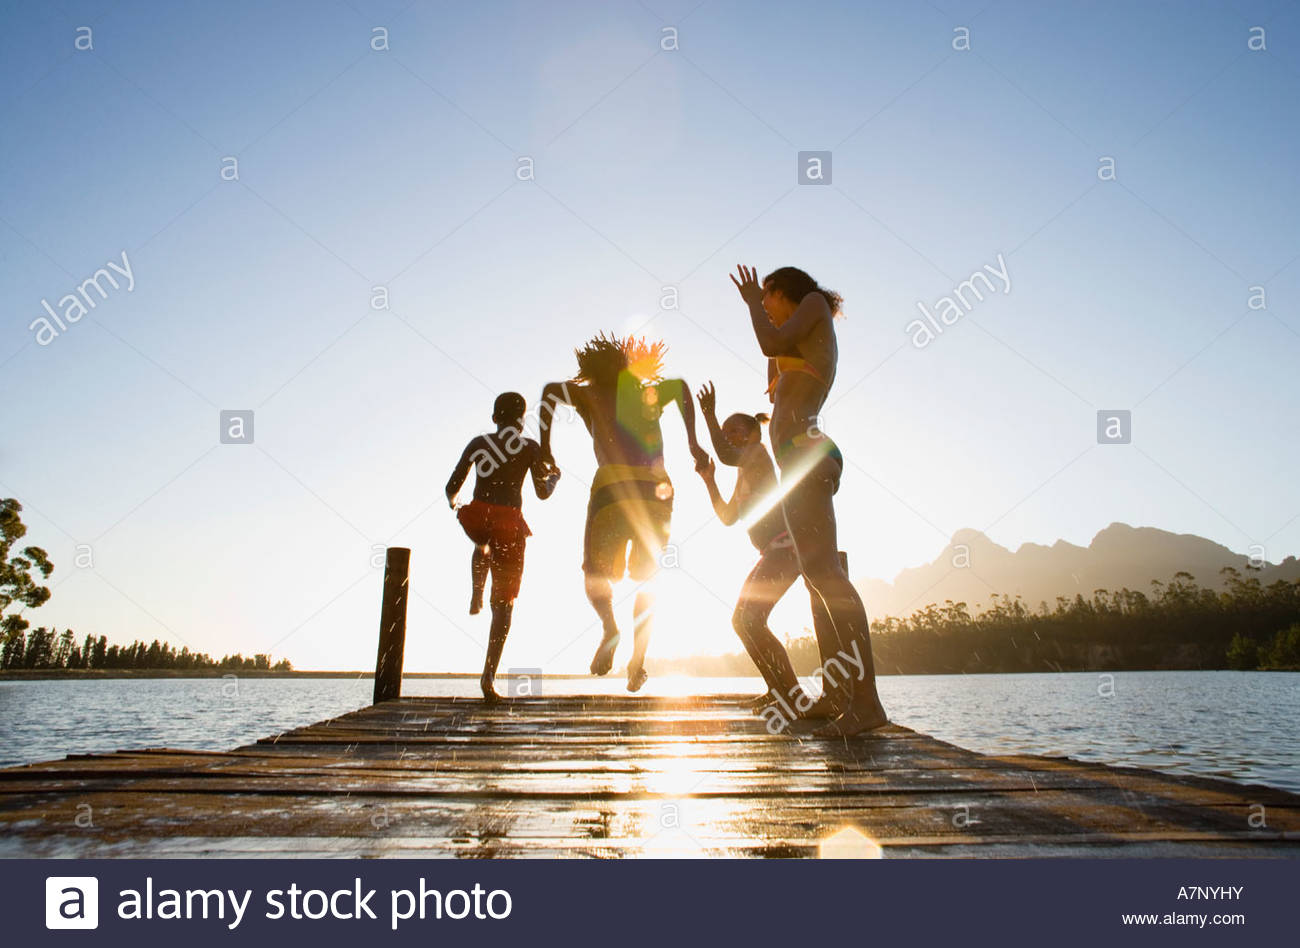 Familie in Badebekleidung entlang Steg springen in See bei Sonnenuntergang Rückansicht Oberfläche Ebene Stockbild